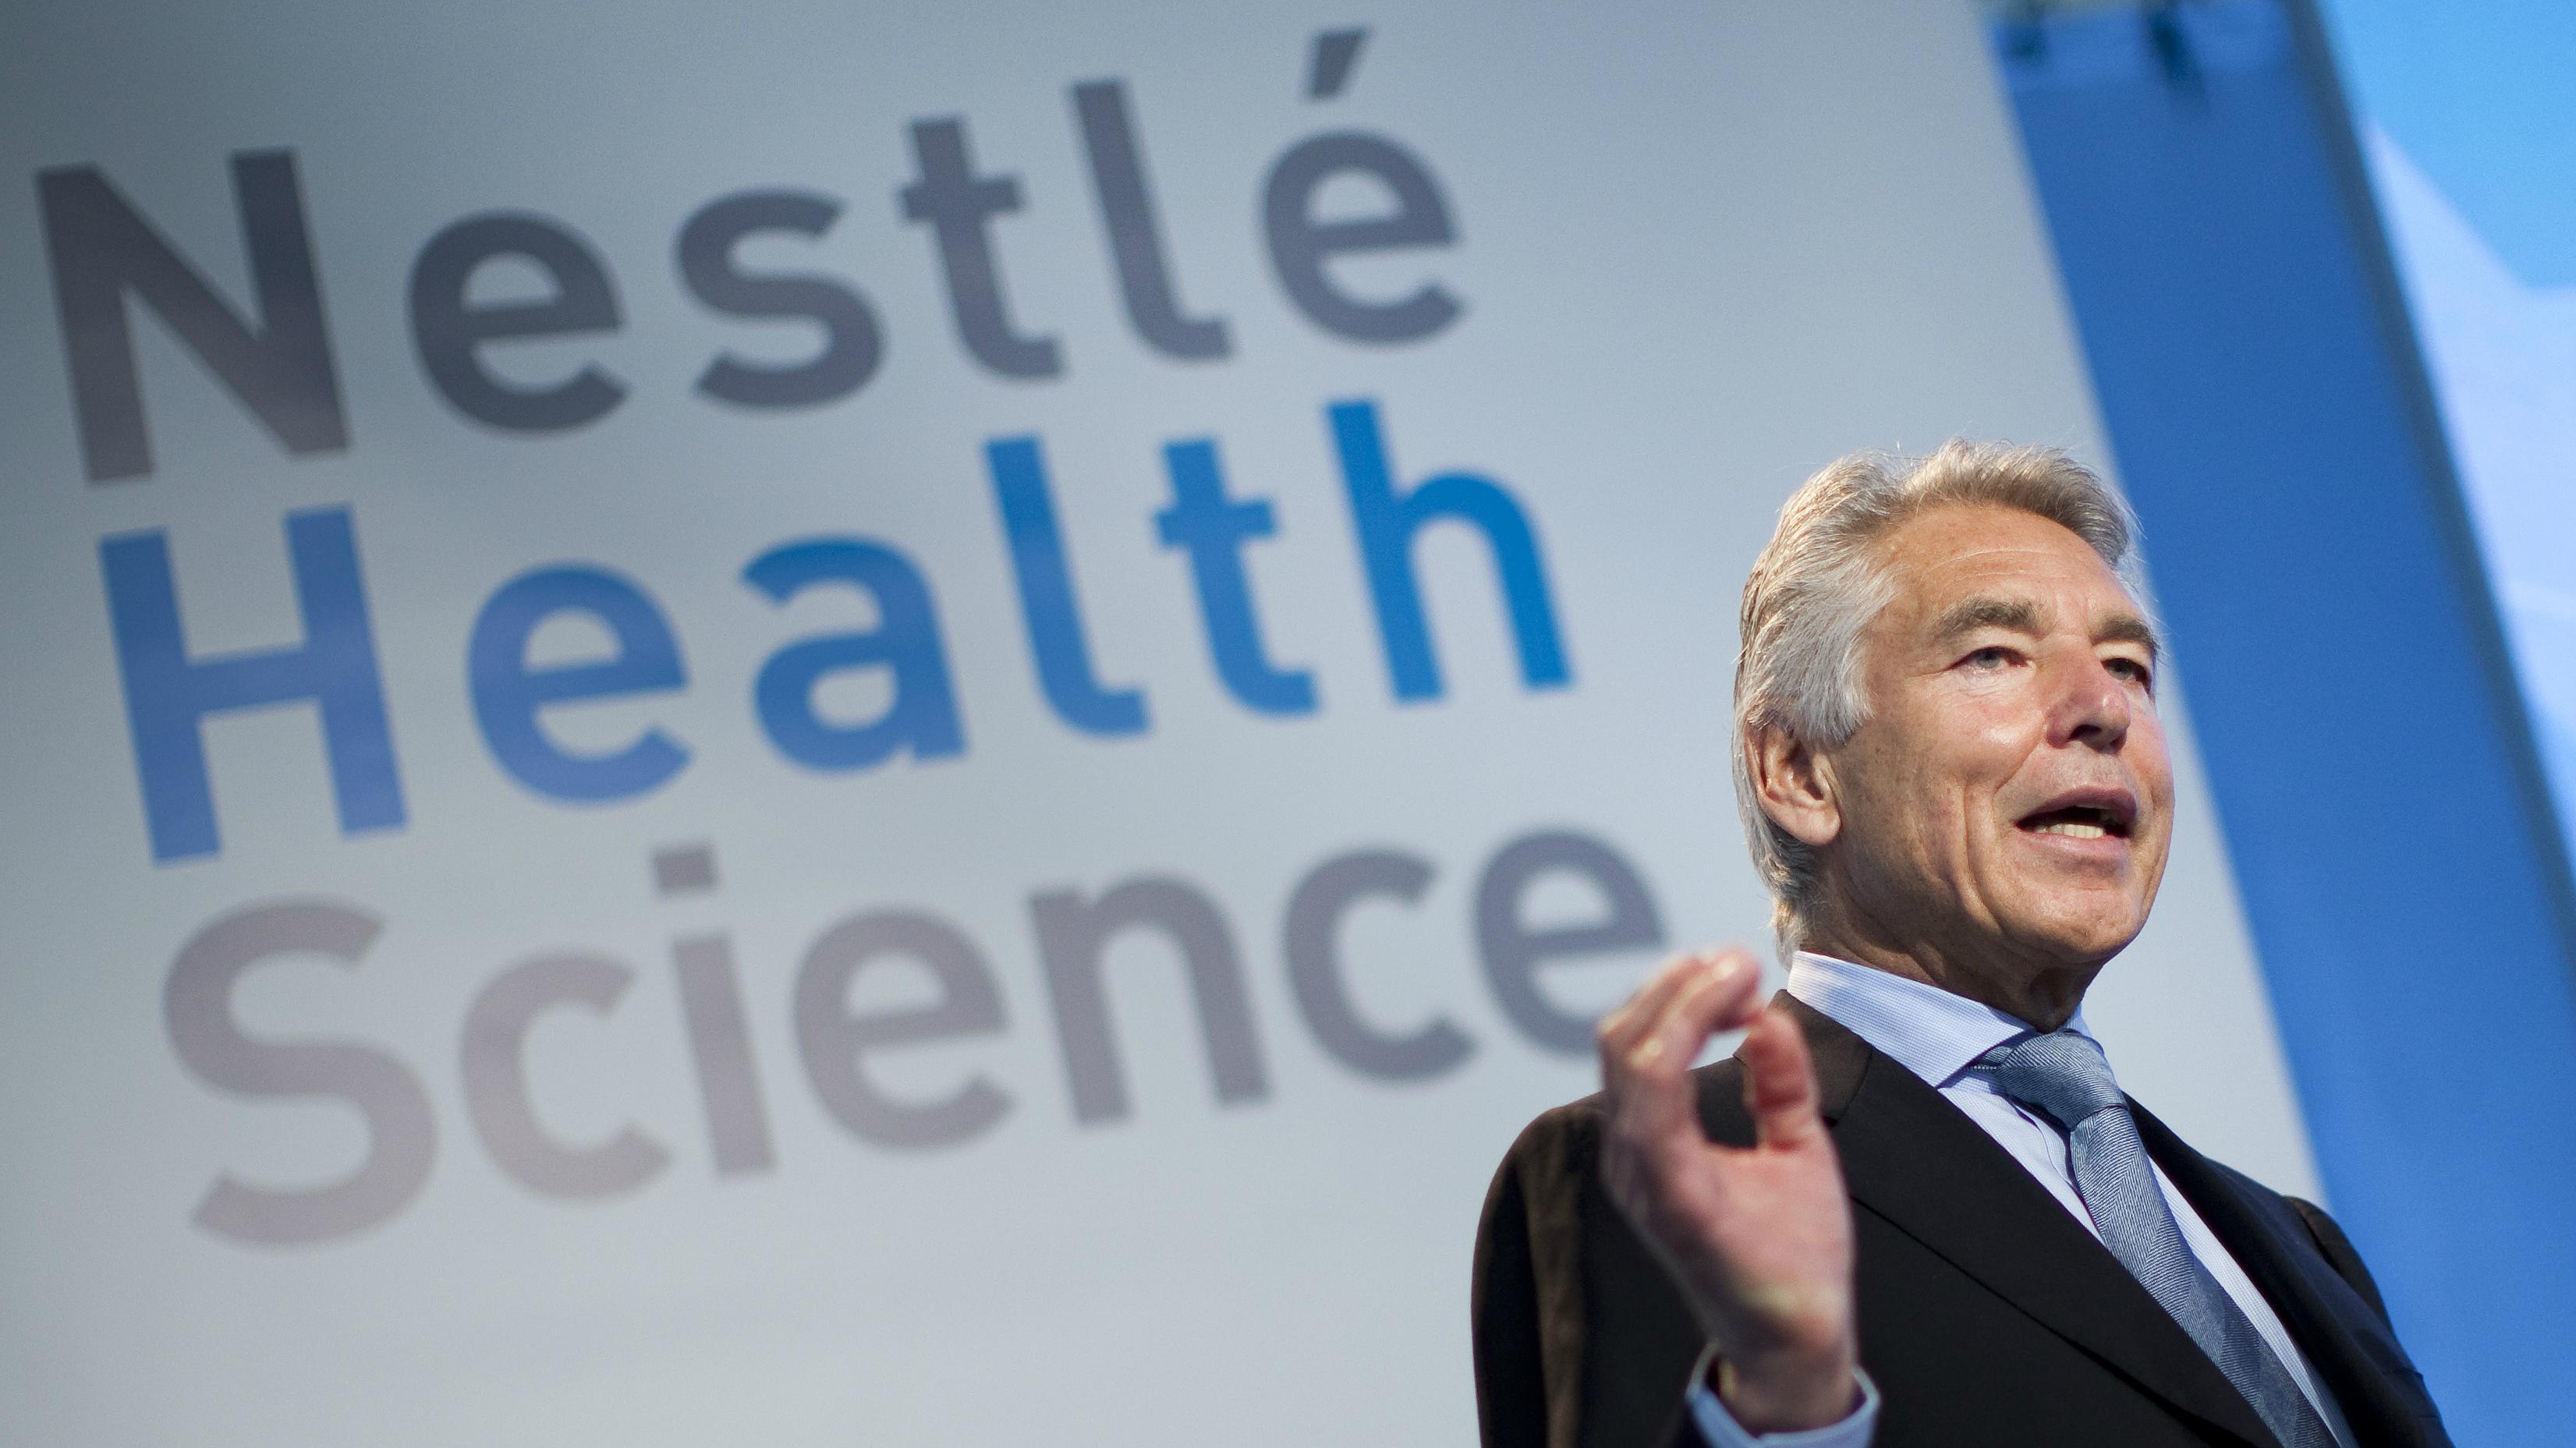 Nestlé chairman Peter Brabeck-Letmathe